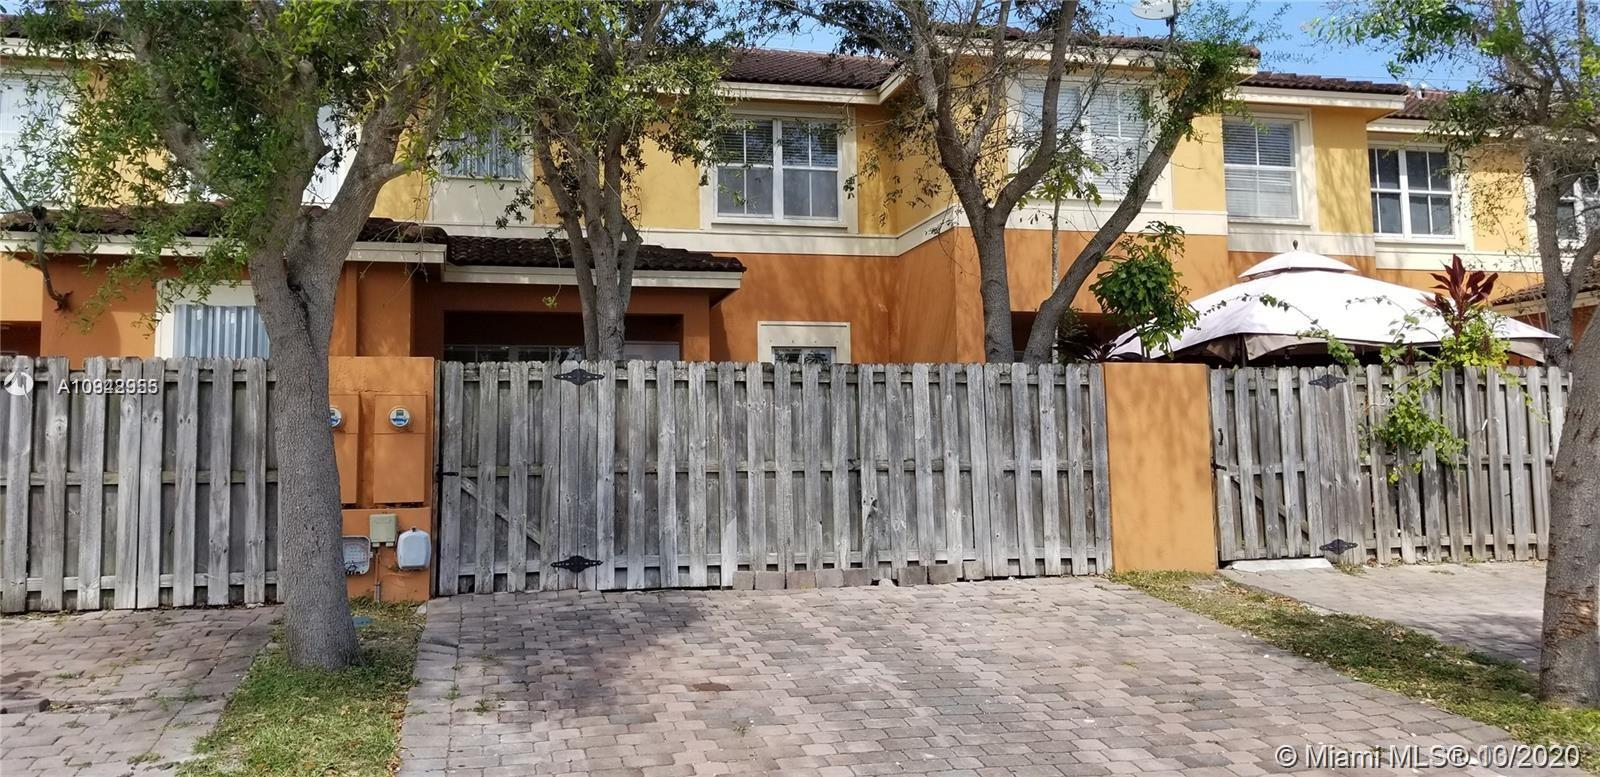 10914 Sw 240th St #10914 Property Photo